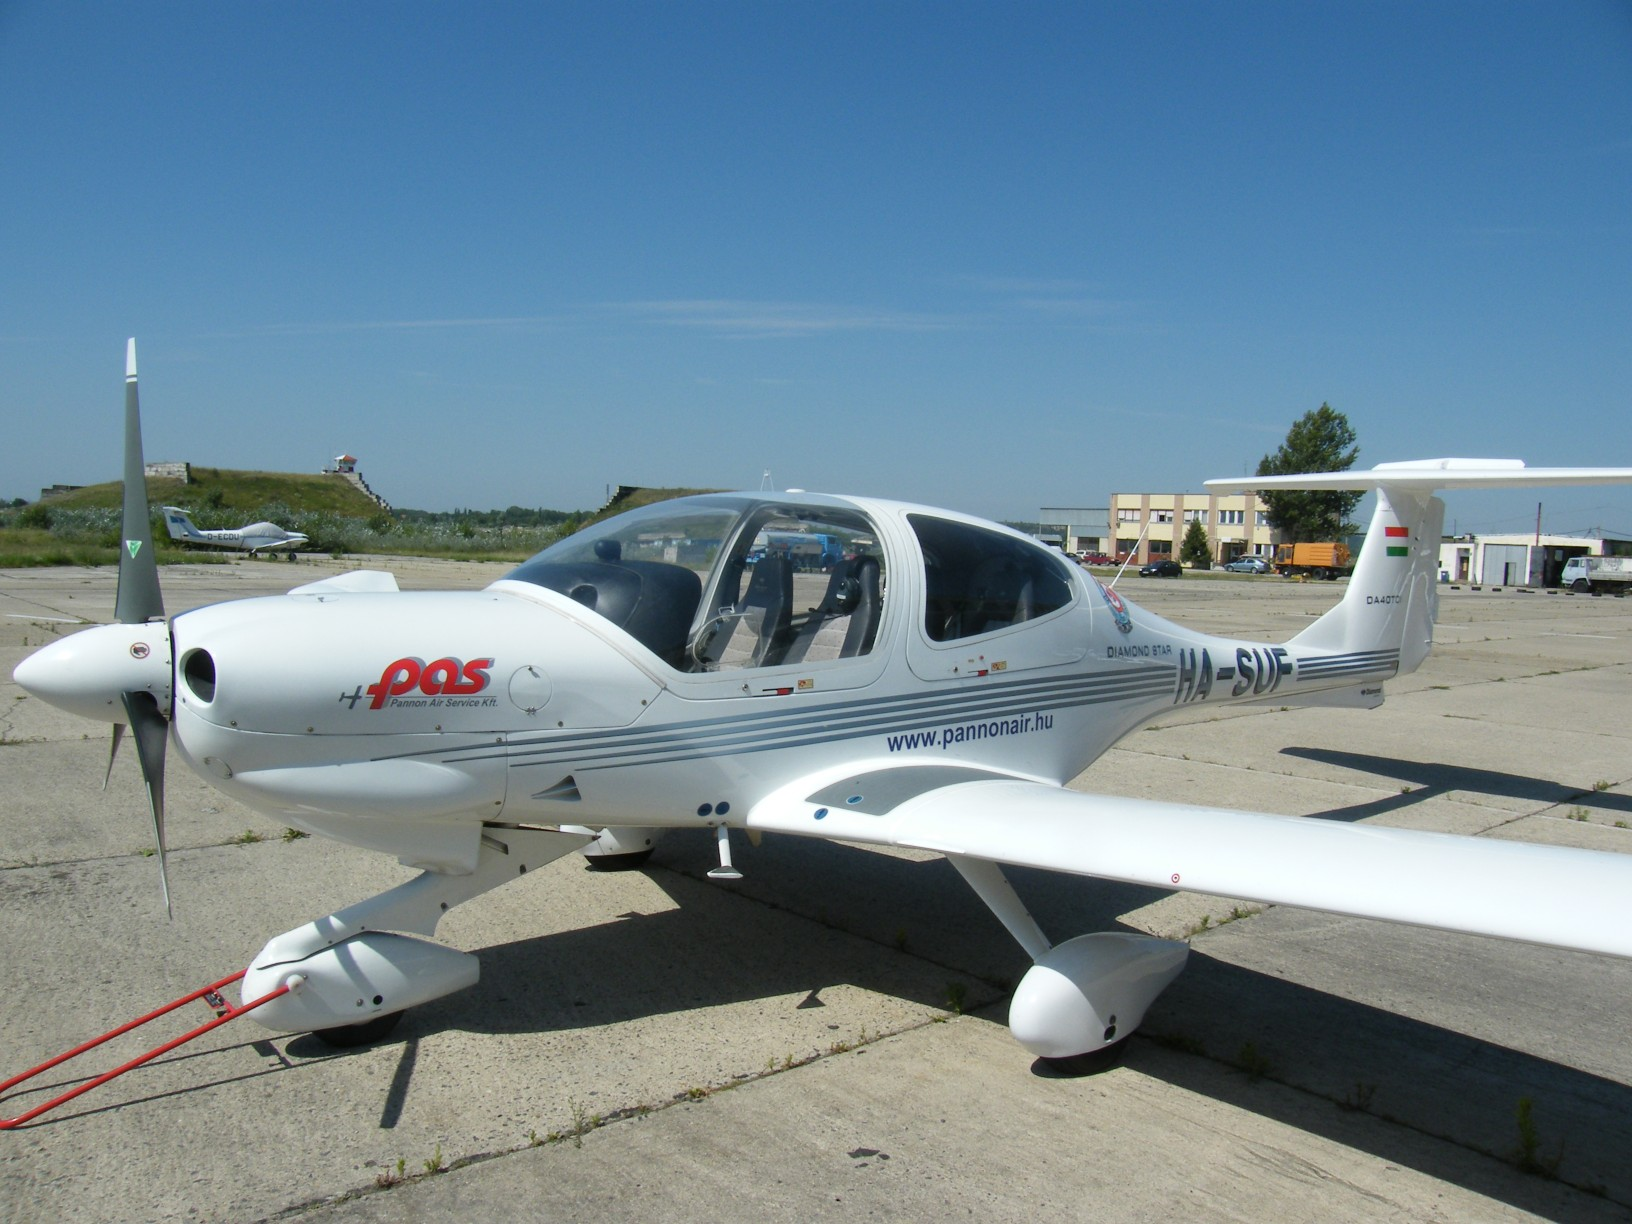 Displaying Aircraft Type - Aviation Fanatic - photo#36